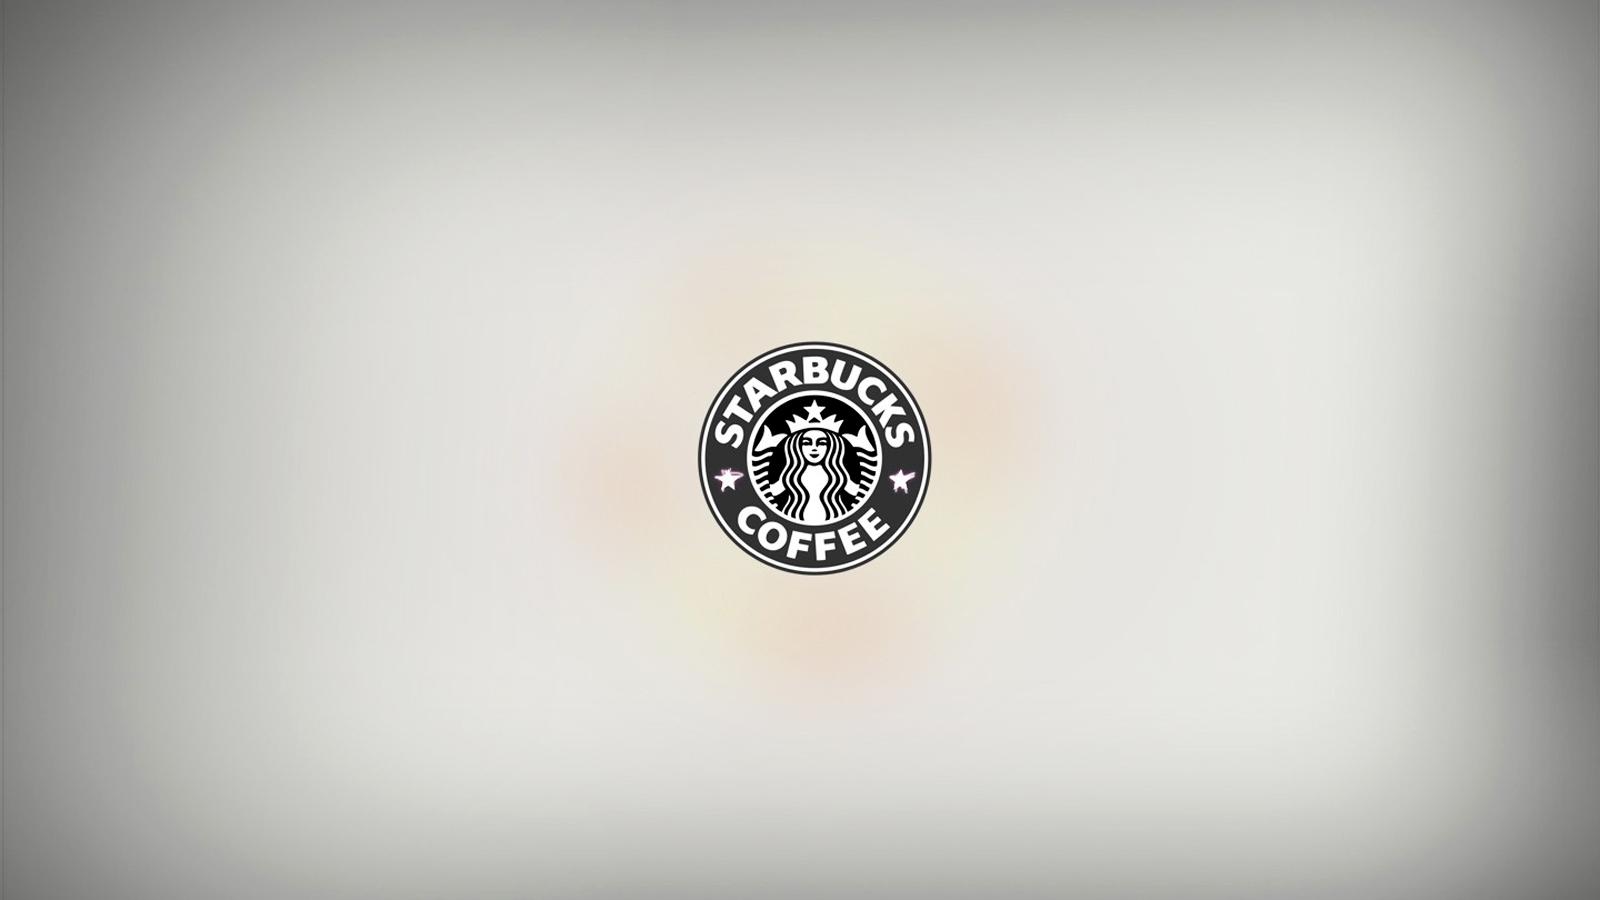 Free download Starbucks Coffee Logo HD